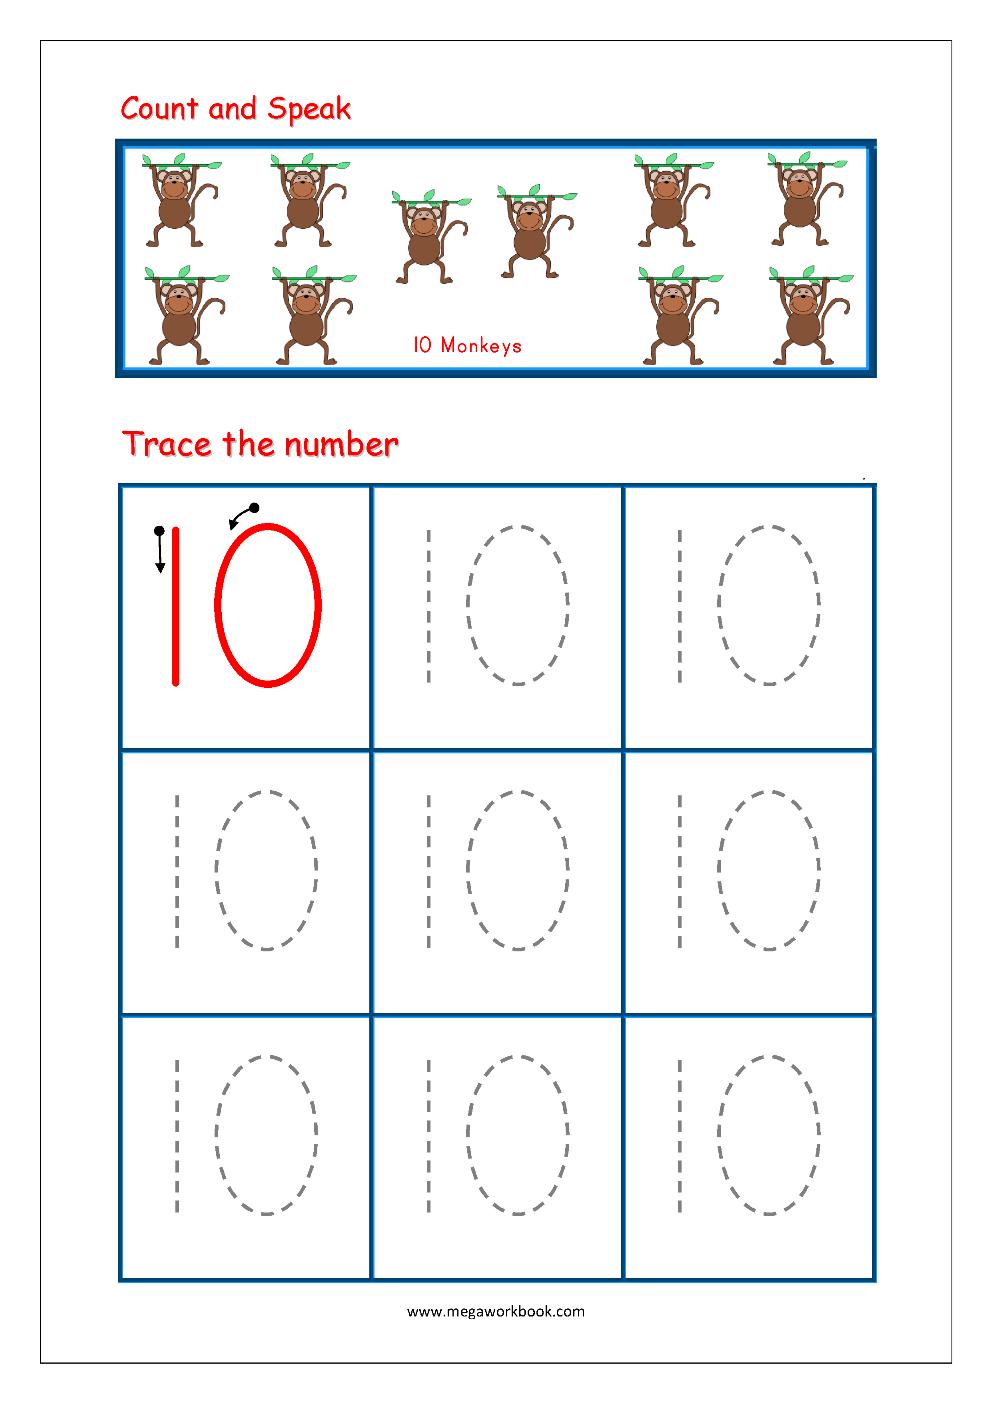 Number Tracing - Tracing Numbers - Number Tracing Worksheets for Alphabet Tracing Worksheets 1-10 Pdf